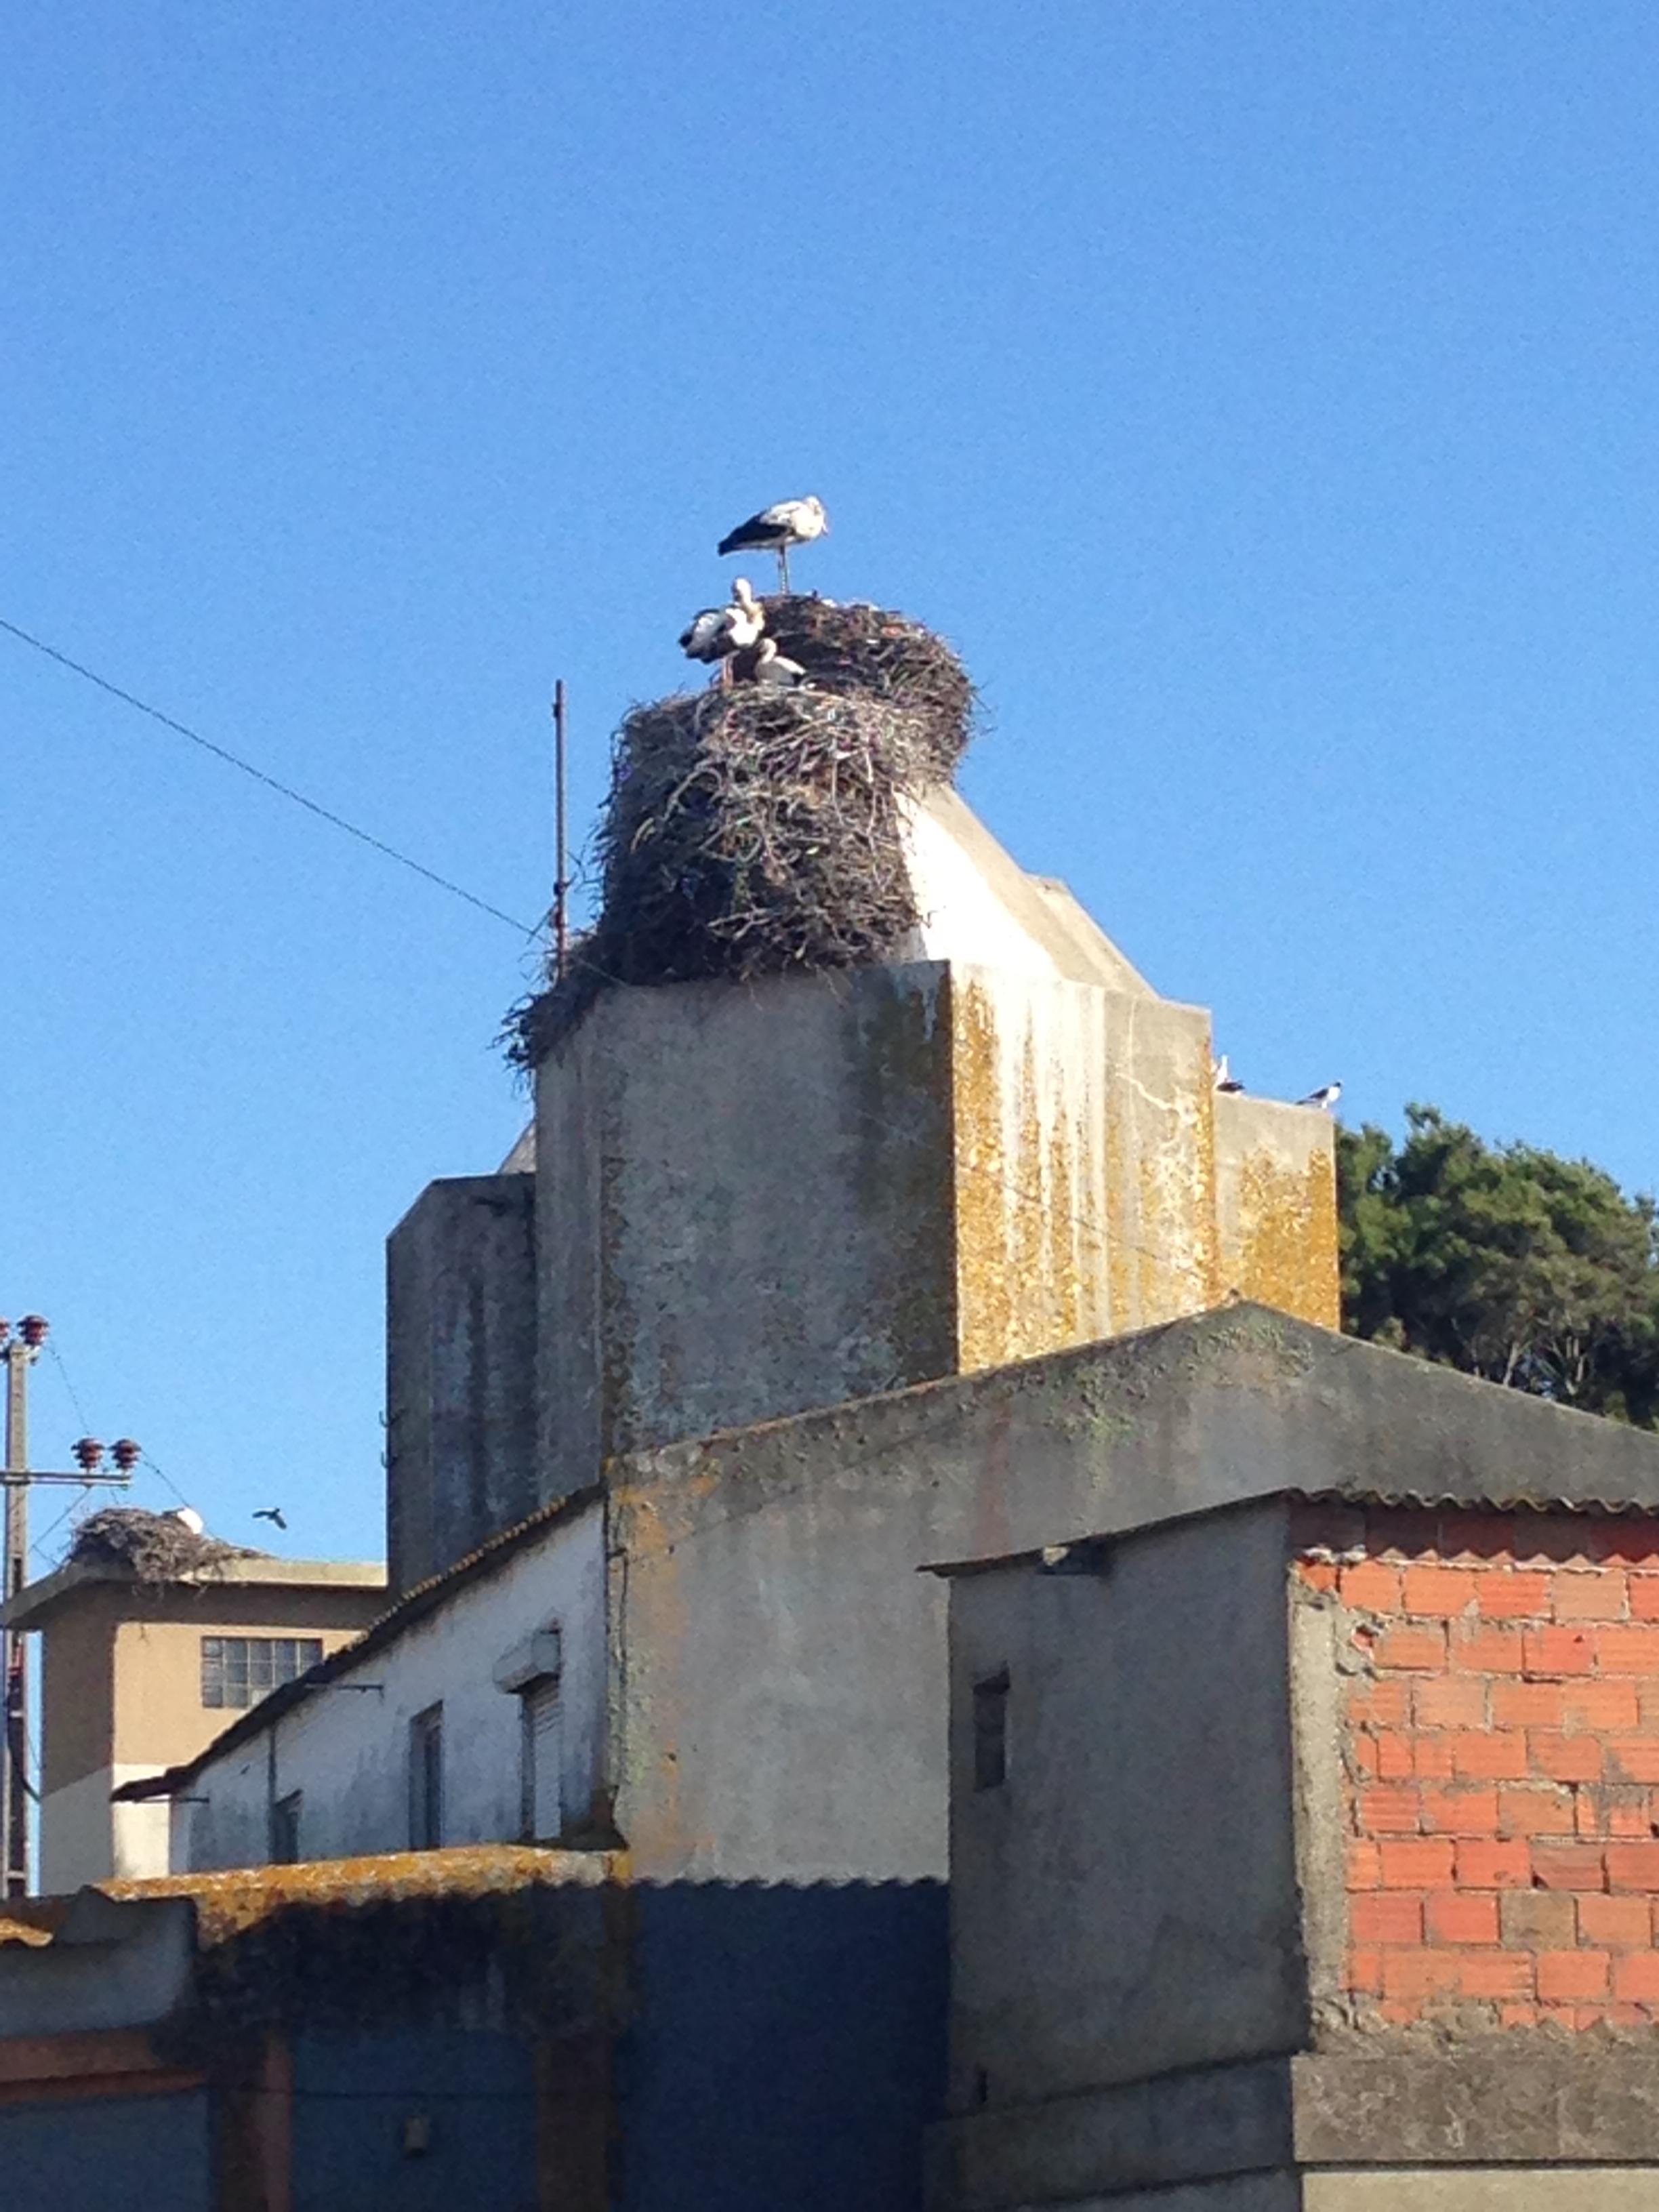 Storks nest at Comporta (06/2014)